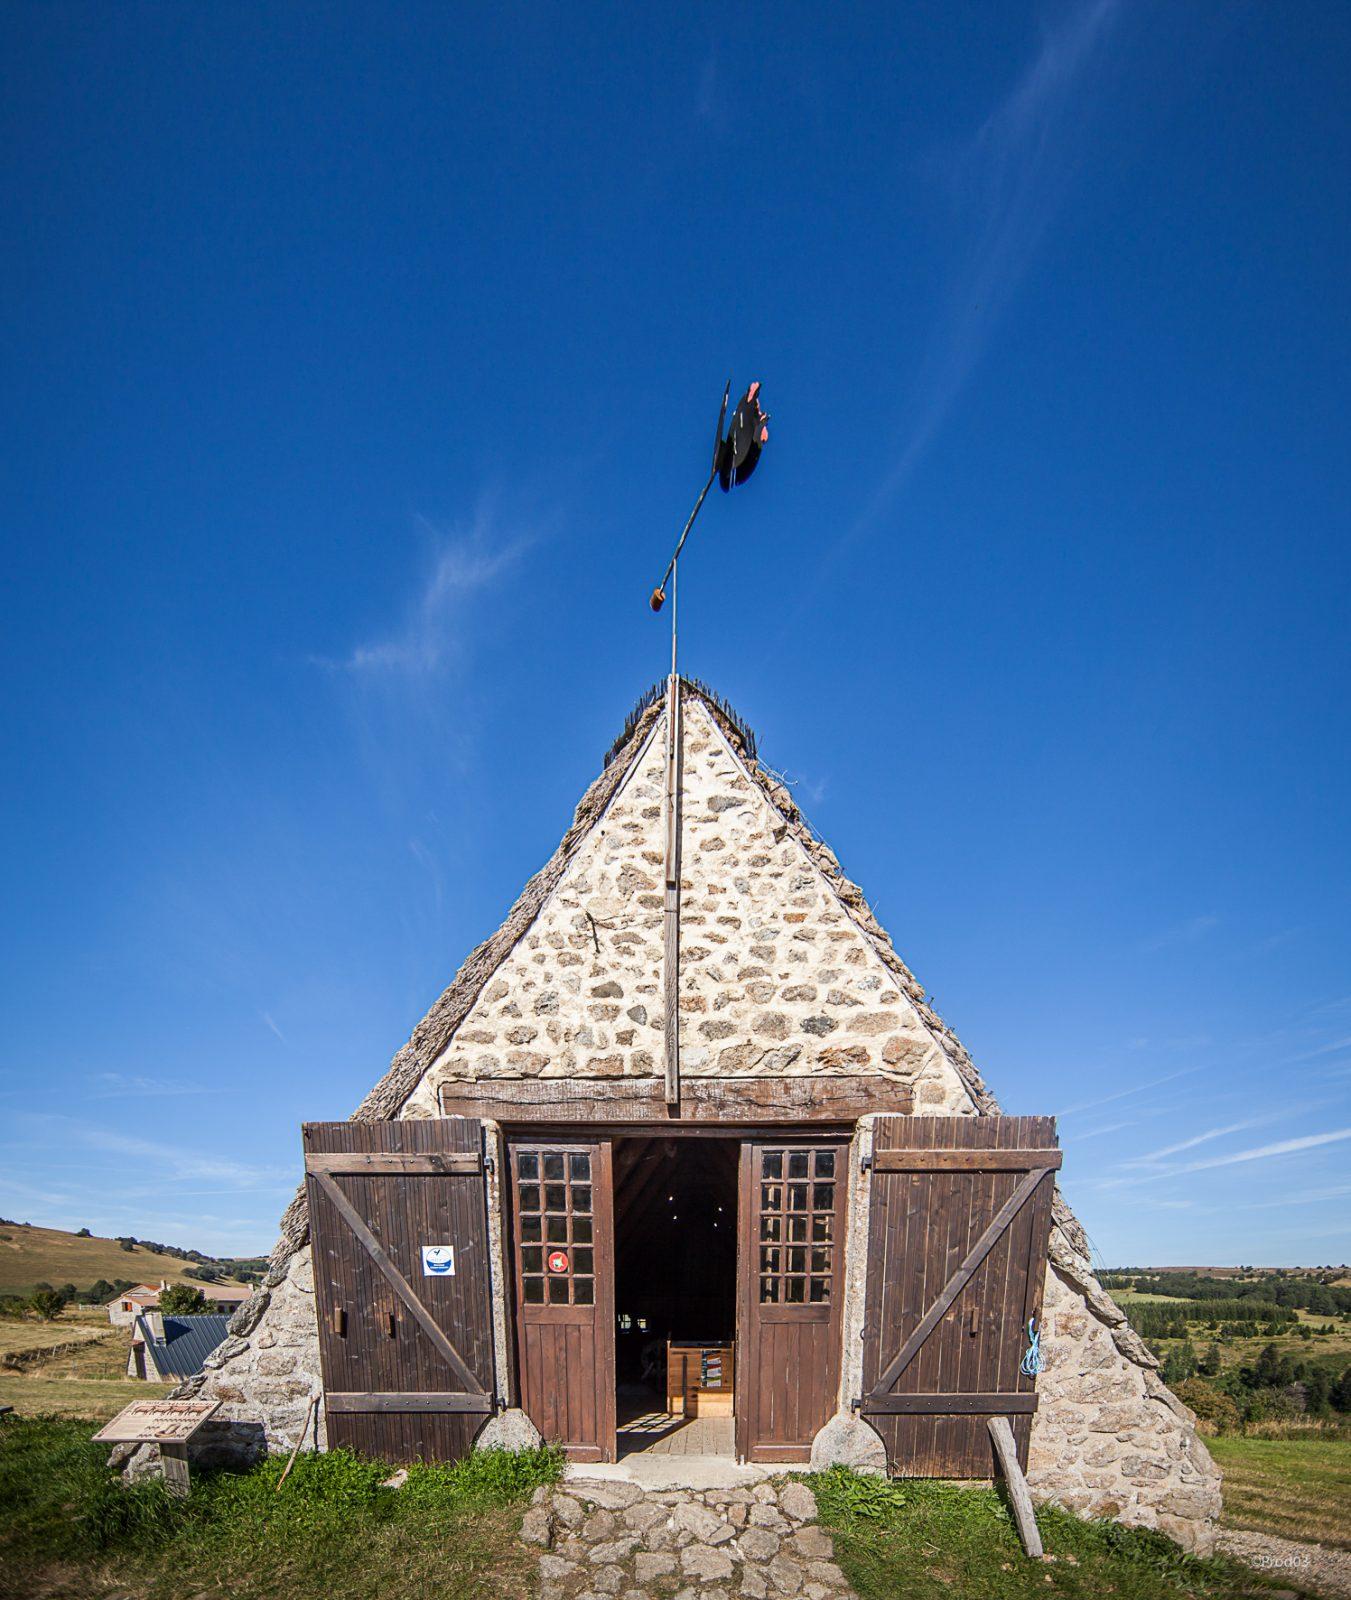 Jasserie-musée du Coq Noir